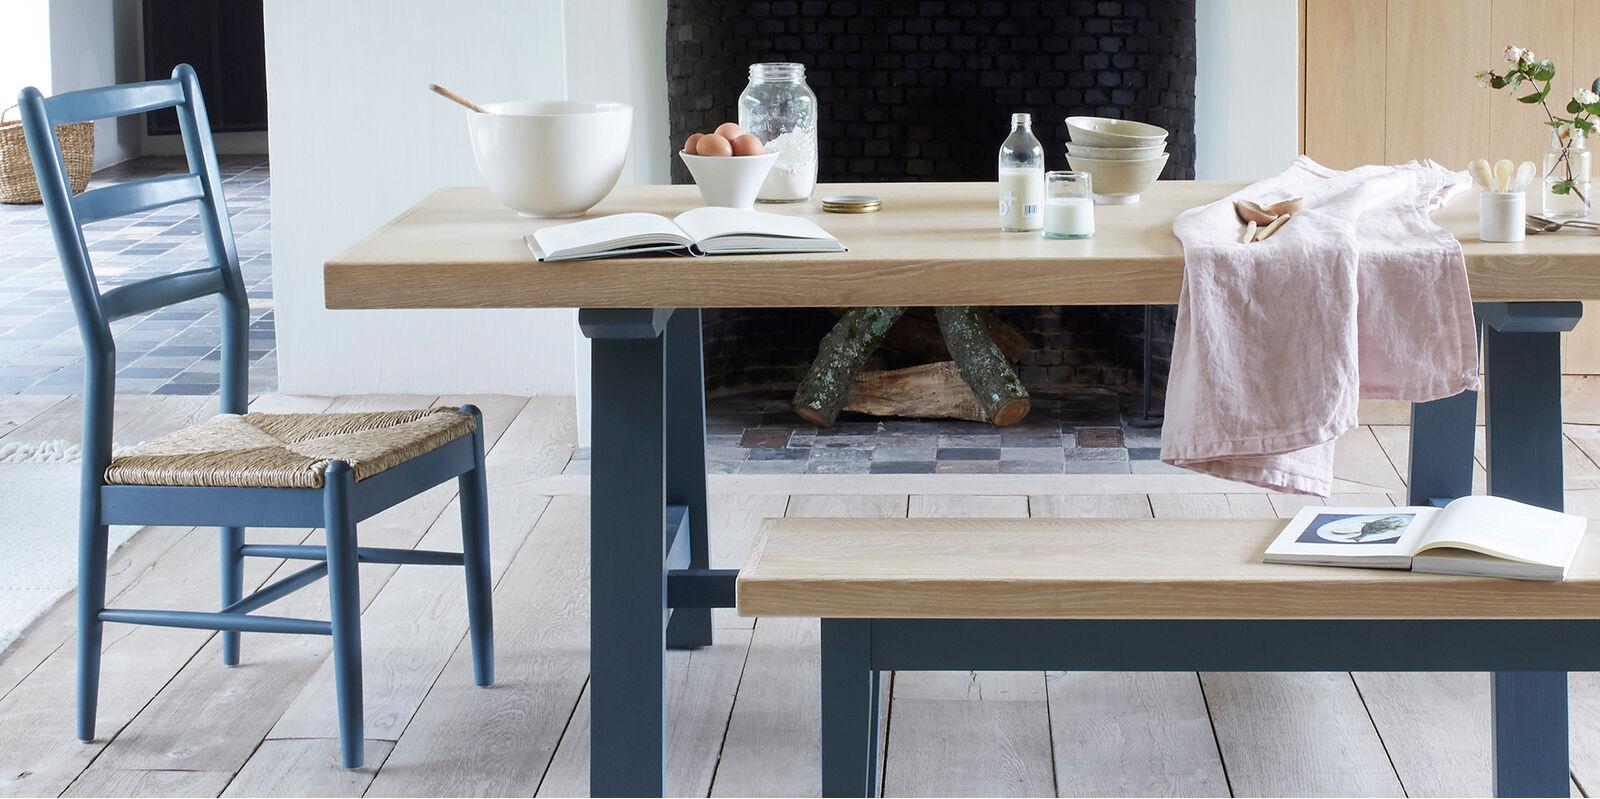 Trestle blue painted kitchen table